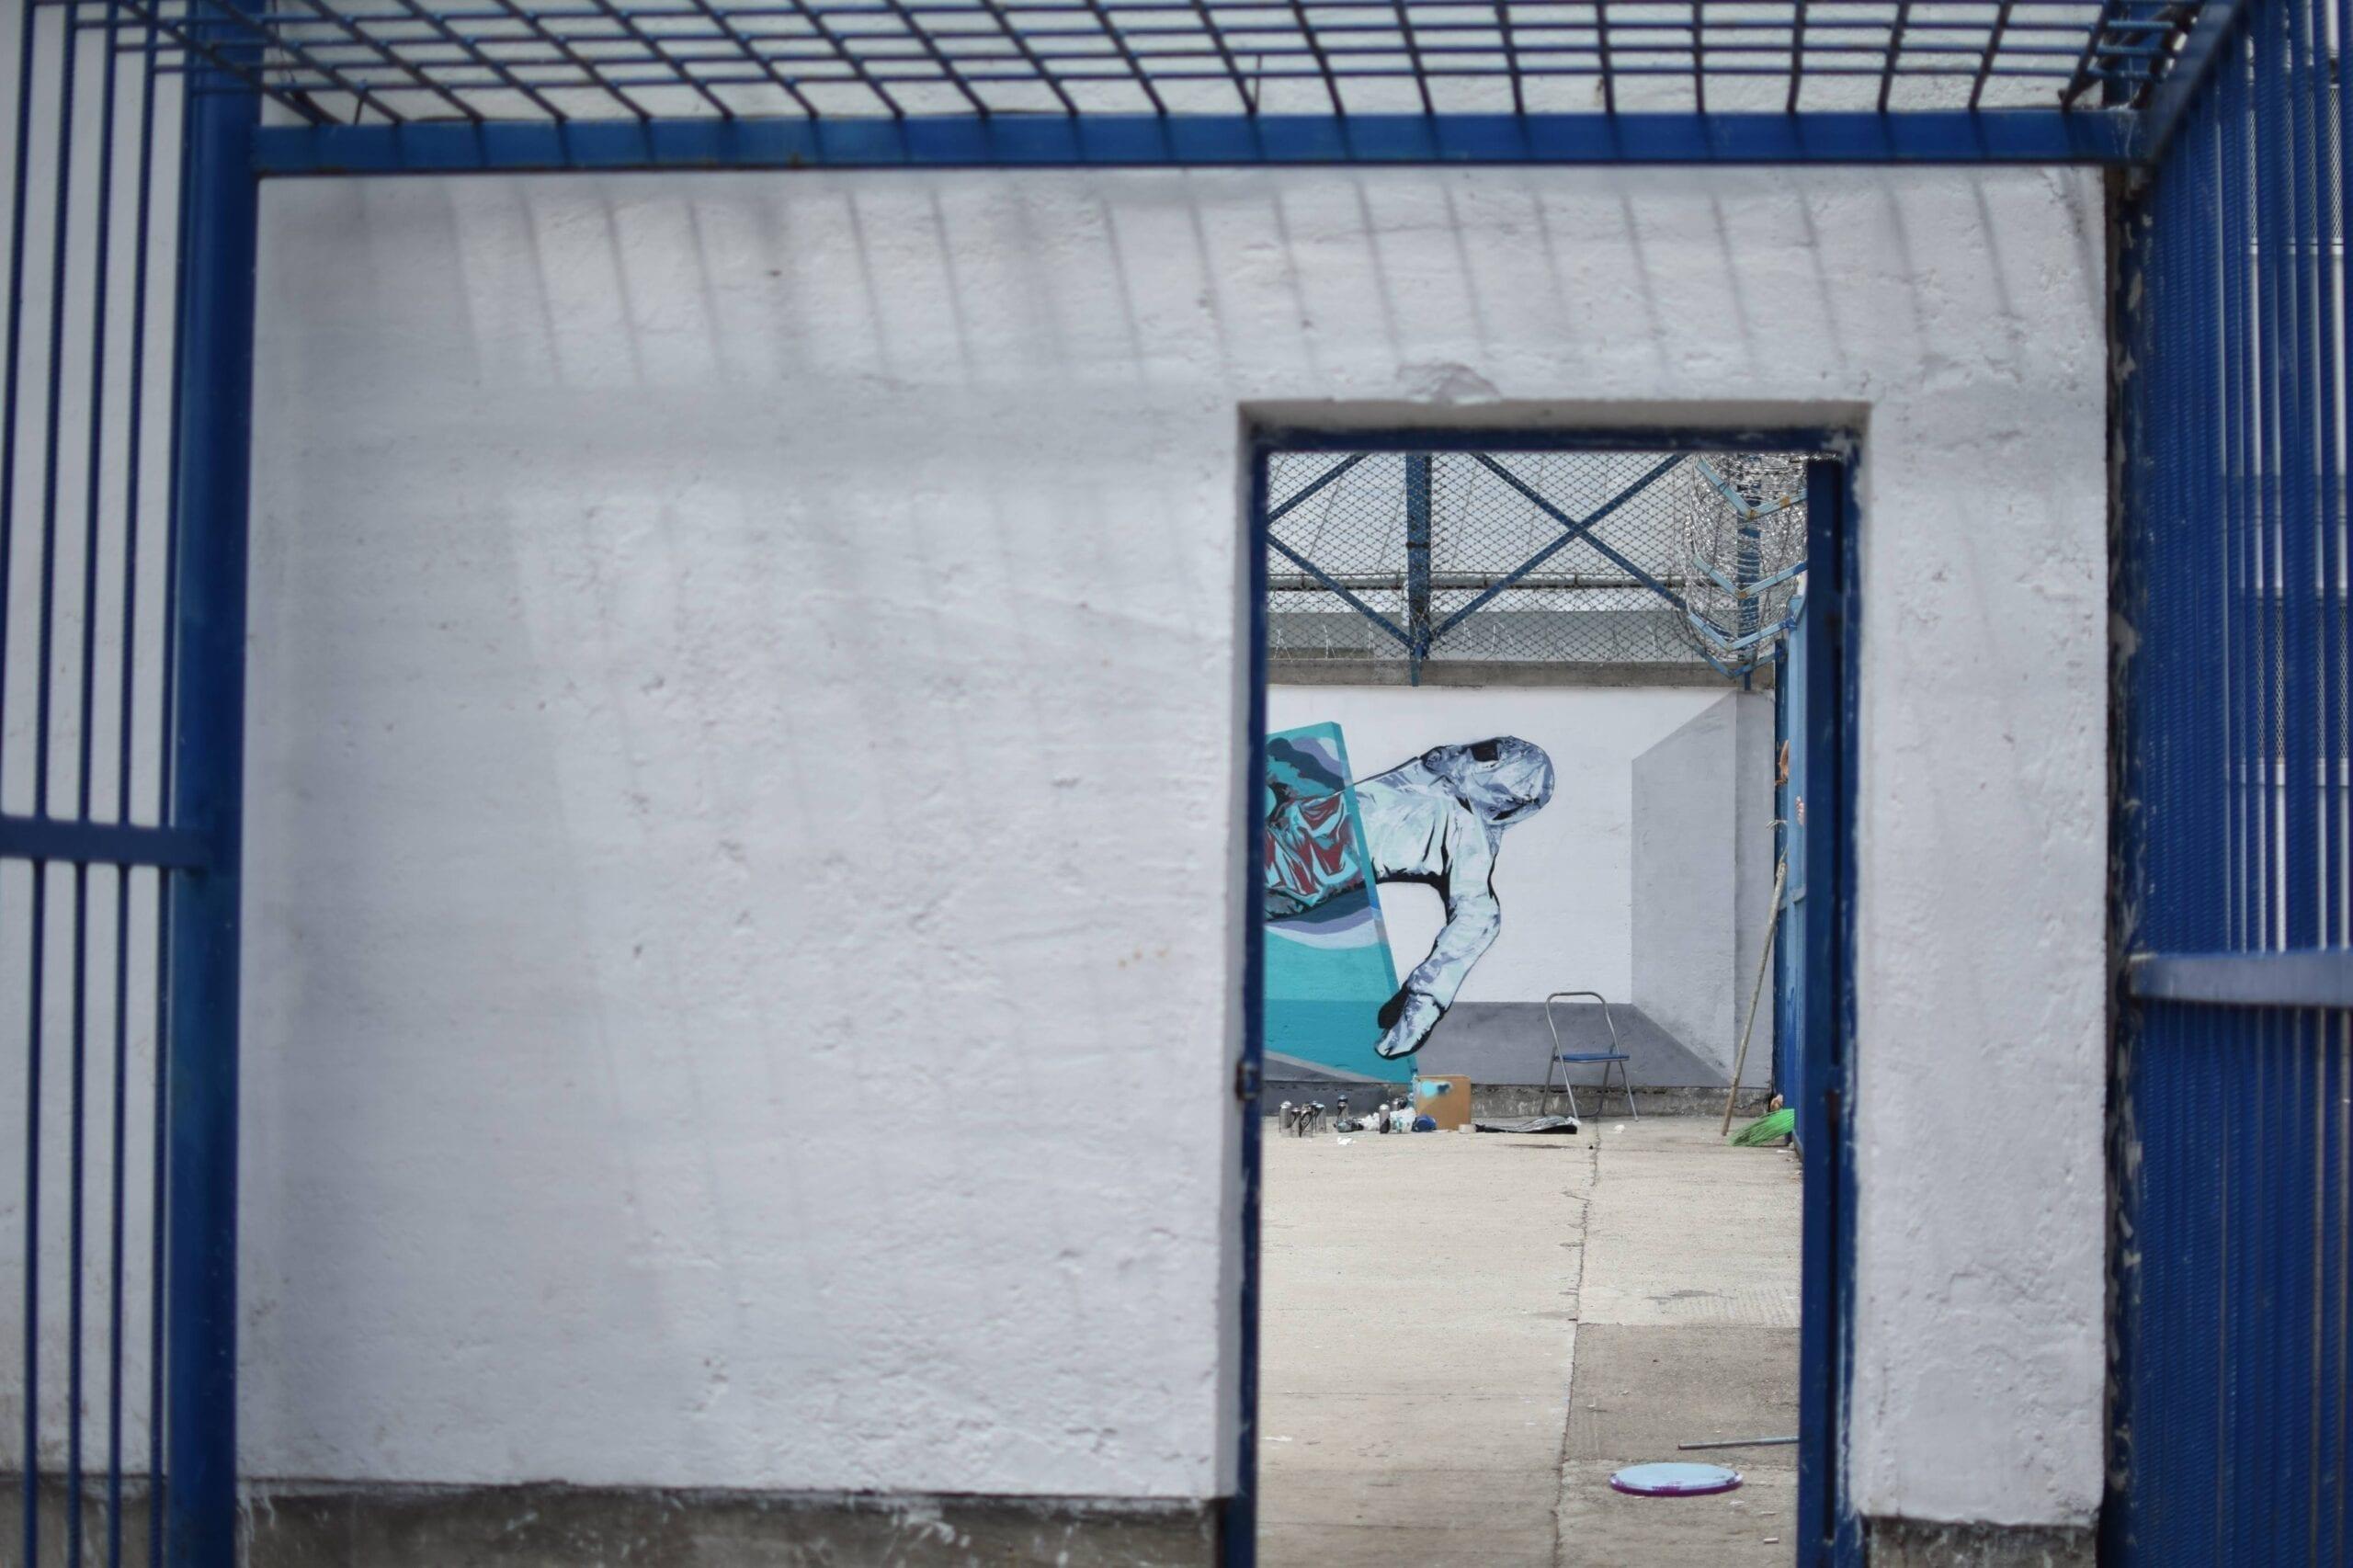 John Dot S. Street Delivery penitenciarul Iași 2018 Un-hidden street art in Romania book art files